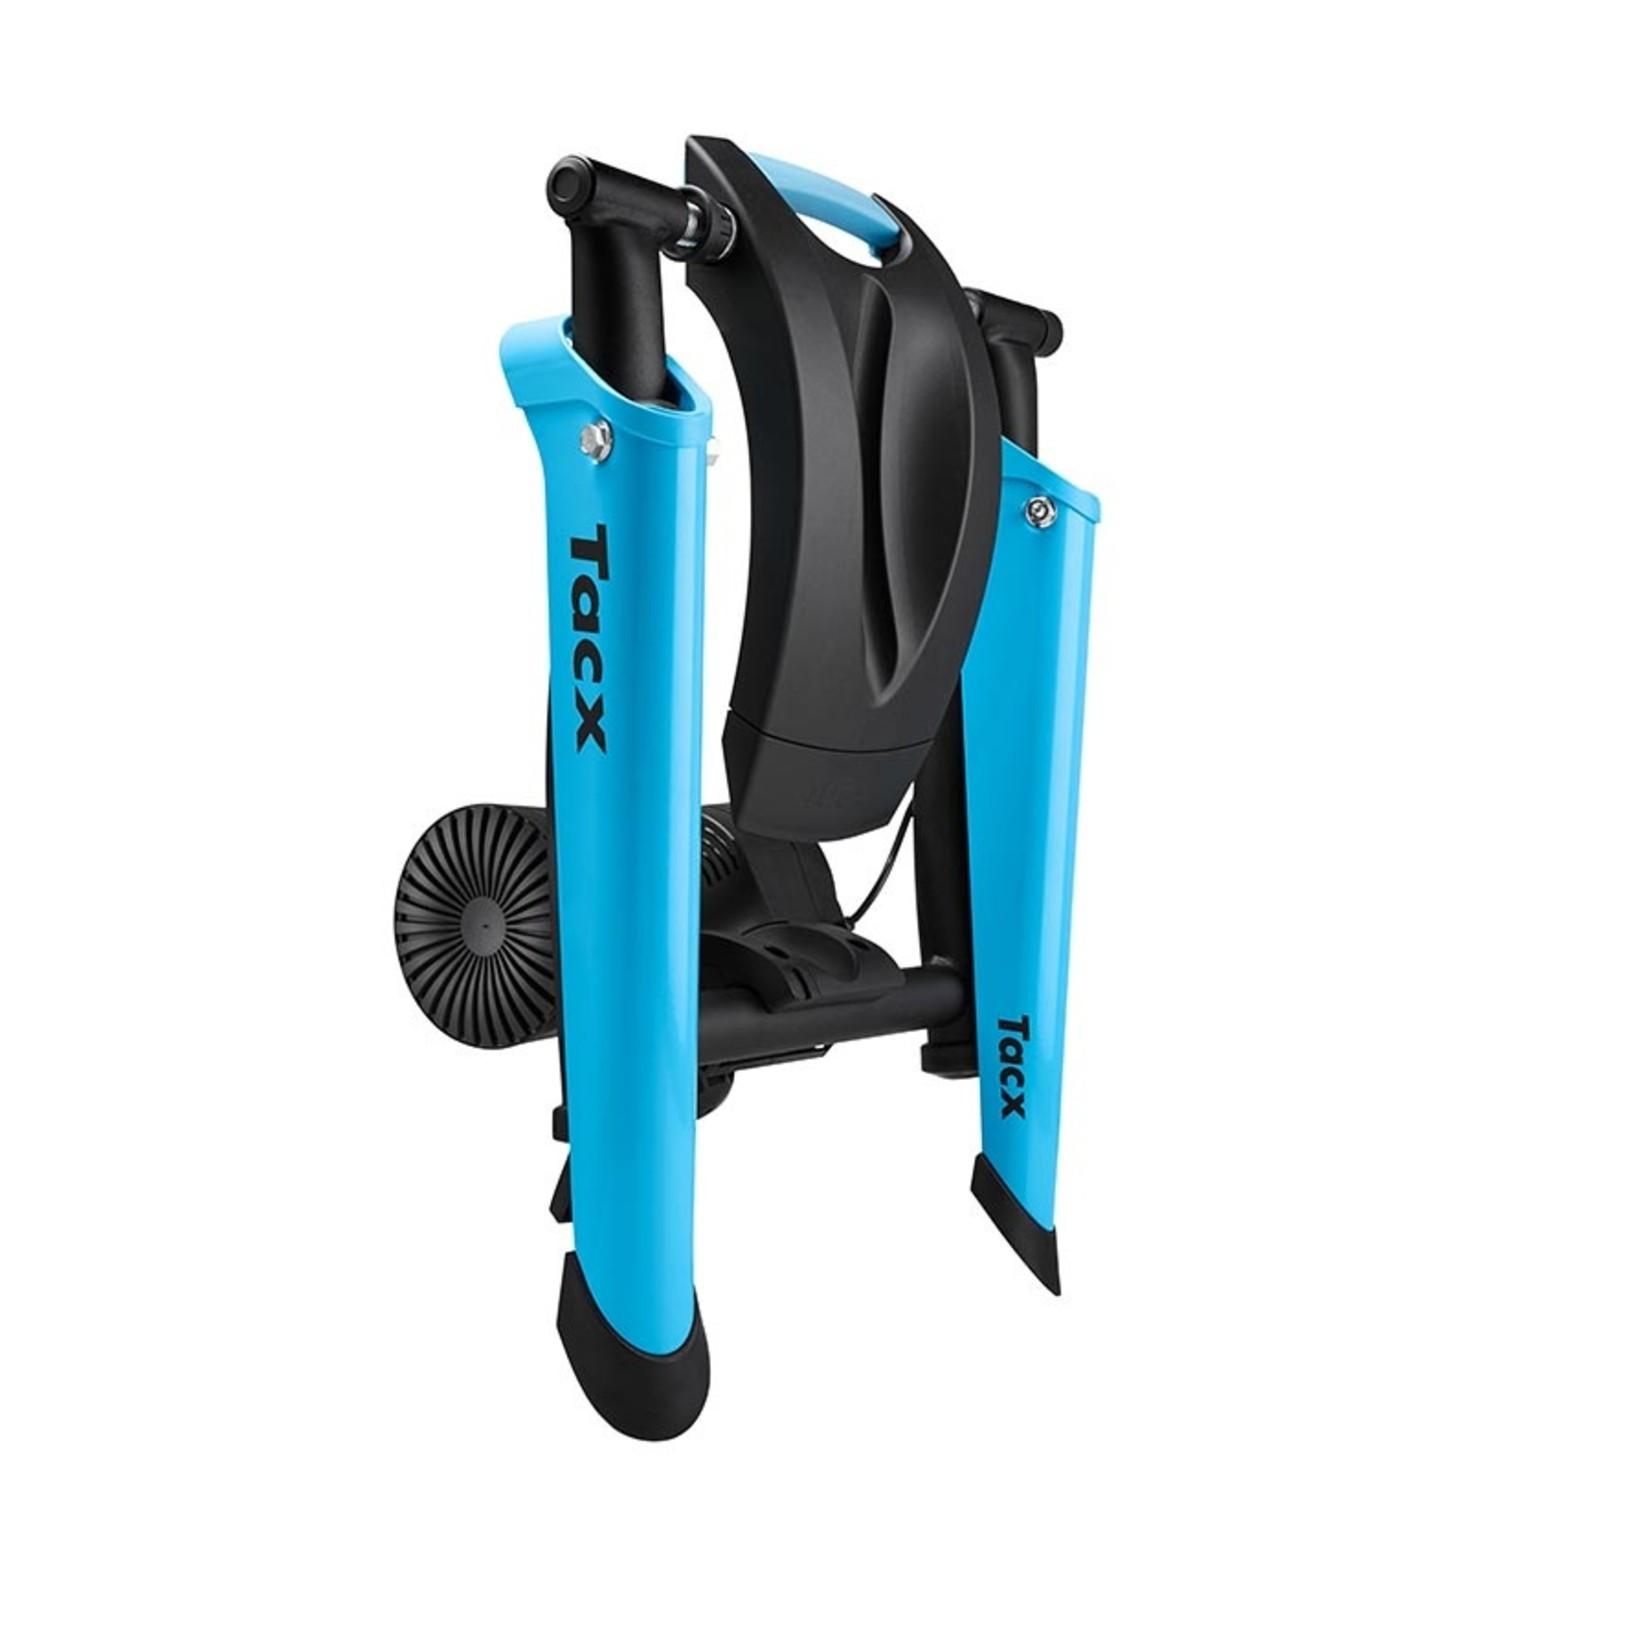 Tacx Tacx Boost Bundle Magnetic Trainer